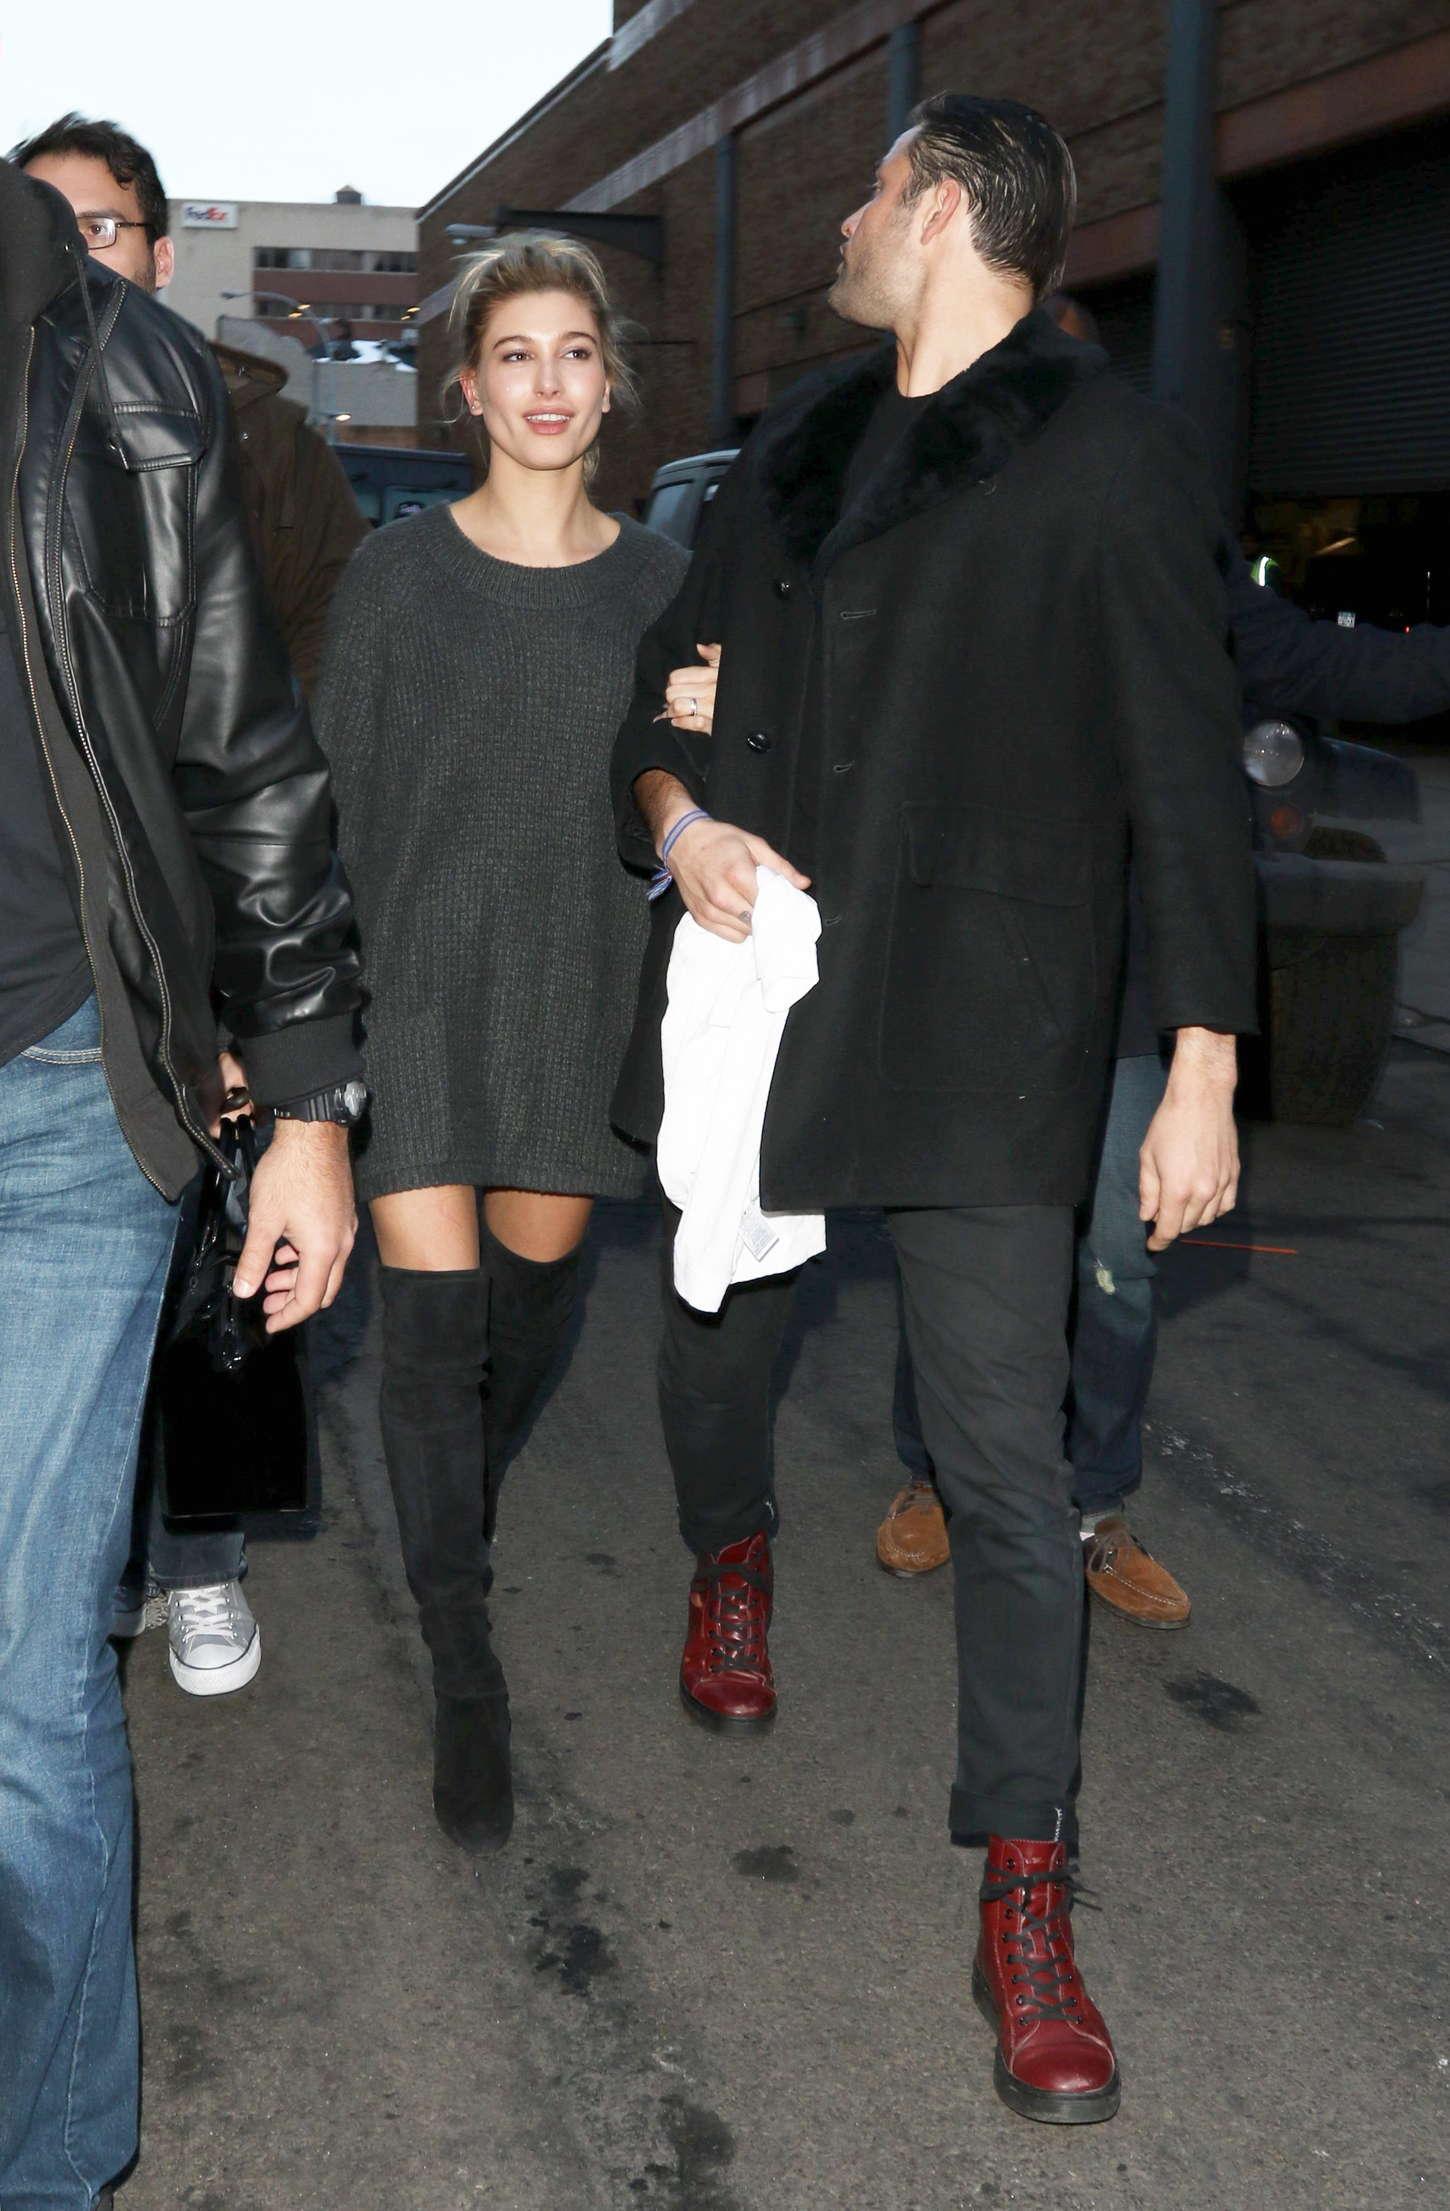 Hailey Baldwin Kanye West 2015 Fashion Show 17 Gotceleb